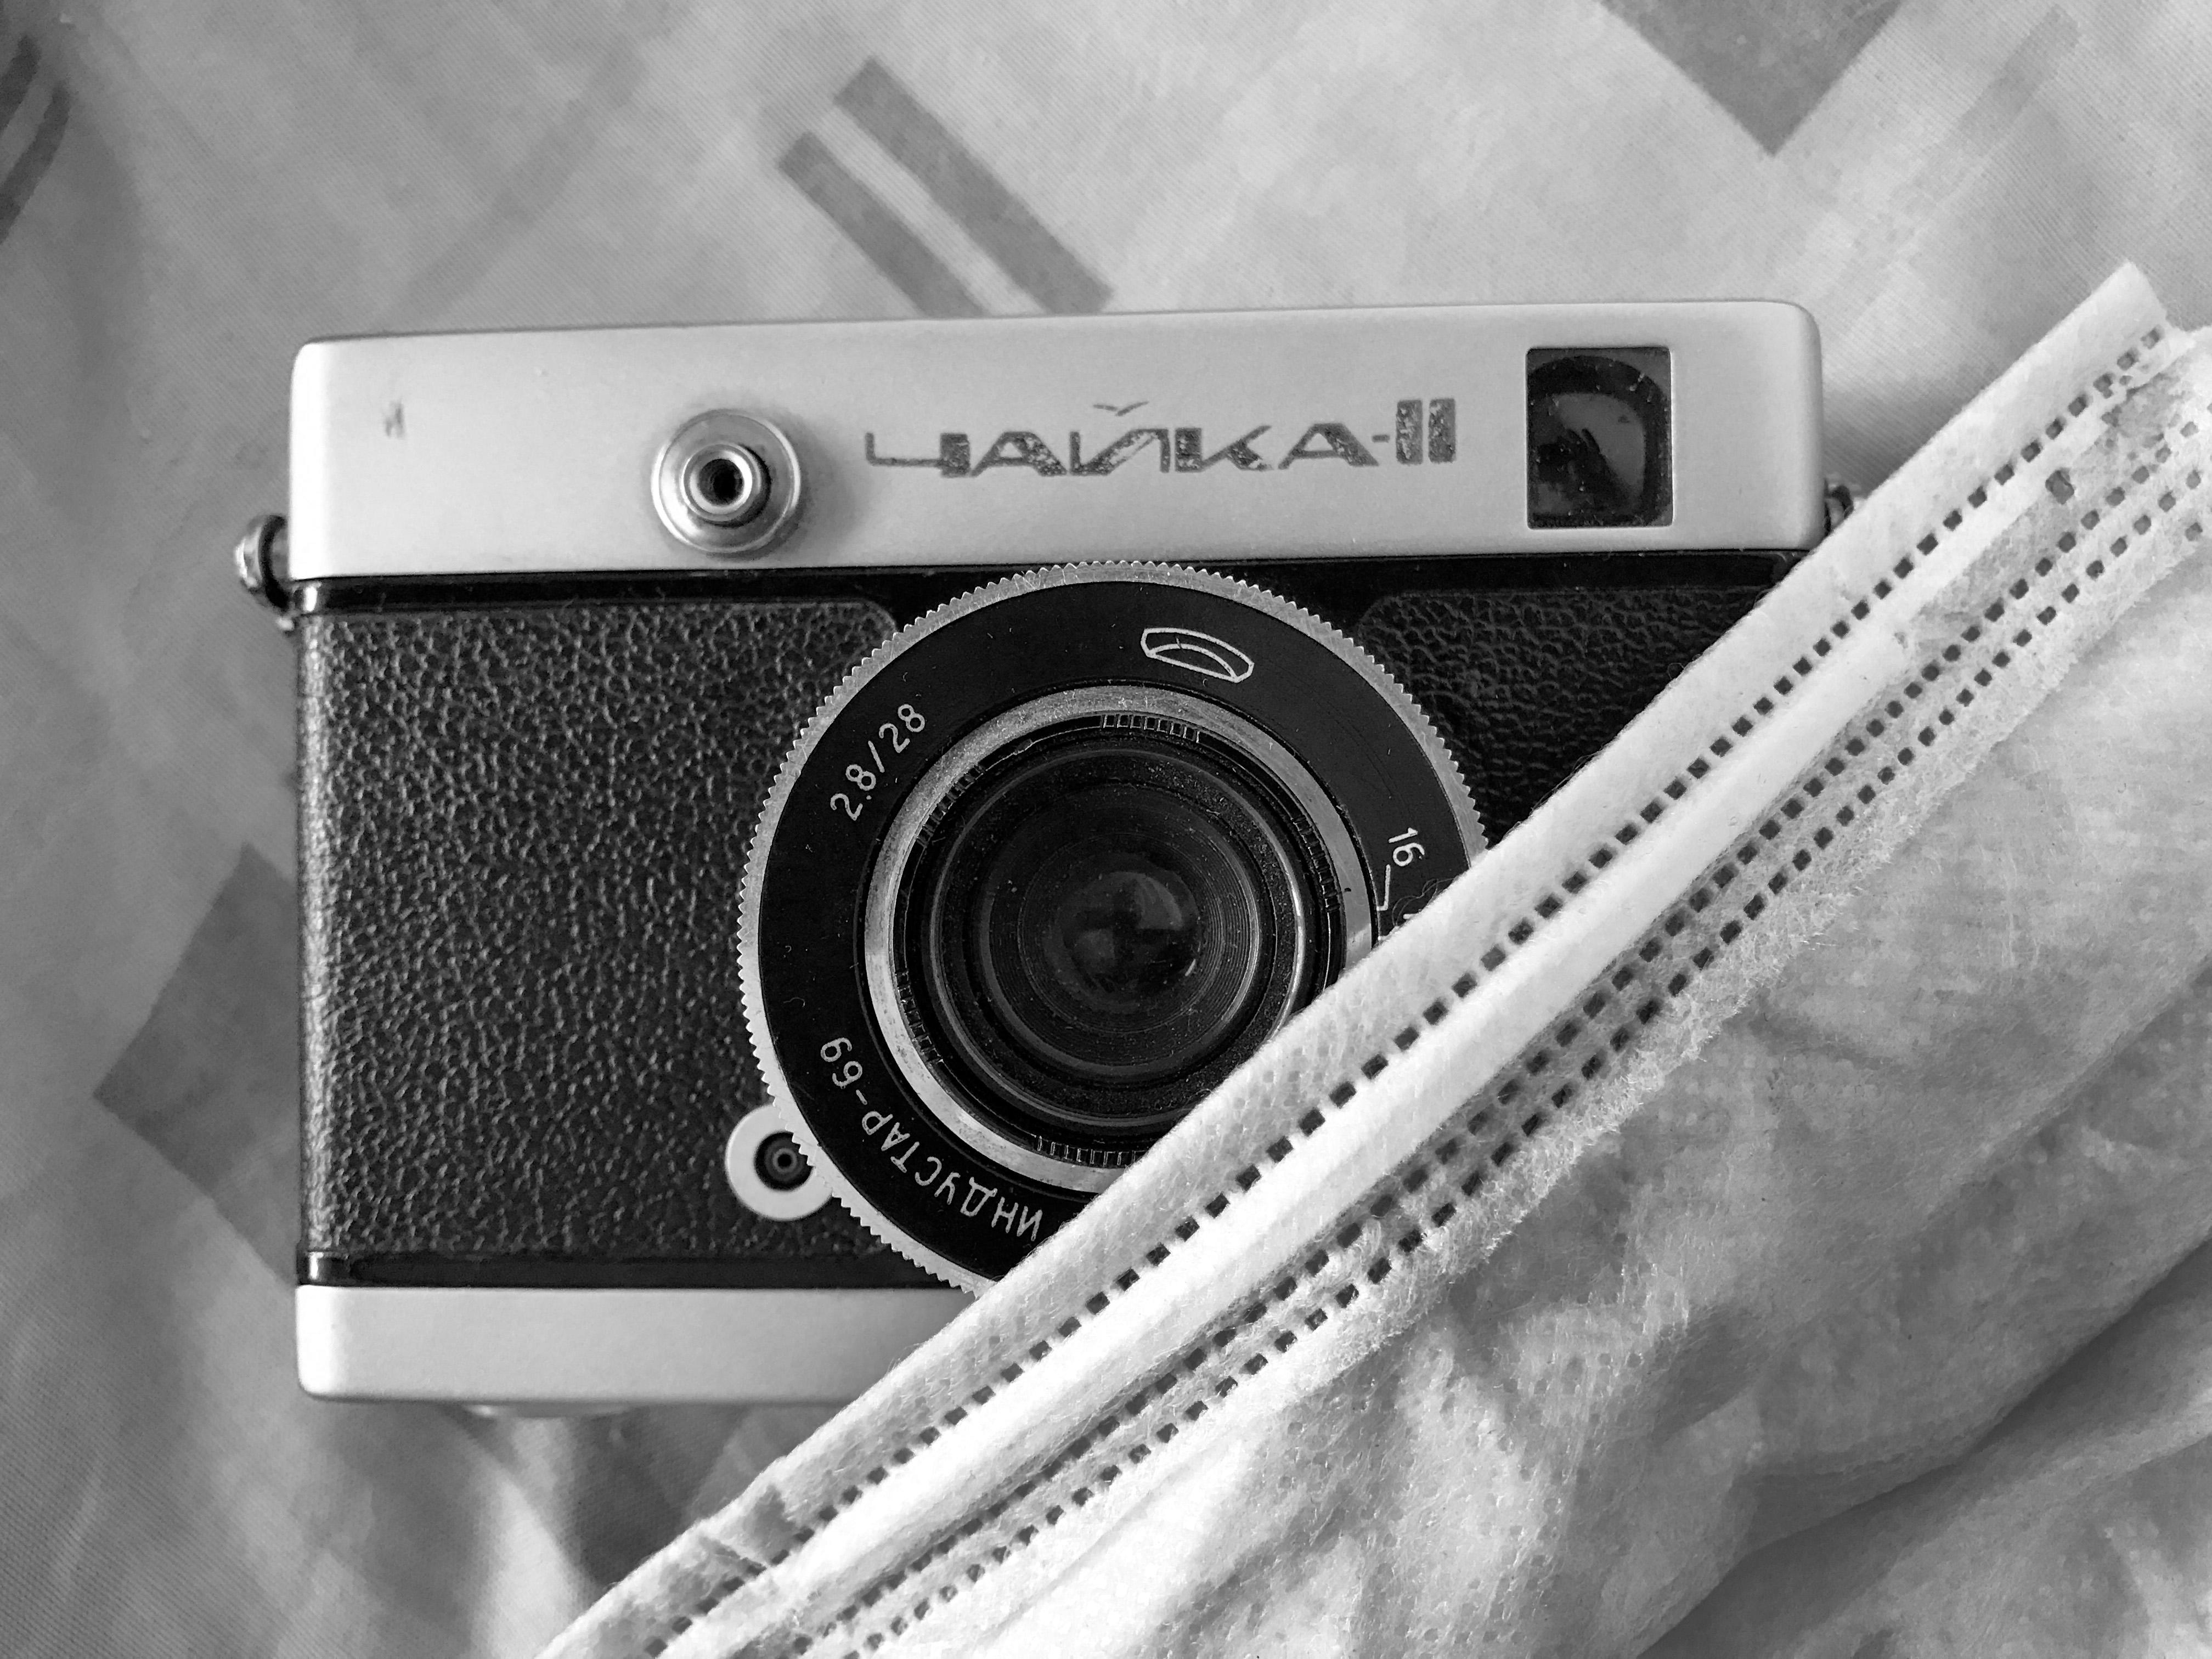 Chaika II camera (Pic: Andrey Khludeyev)